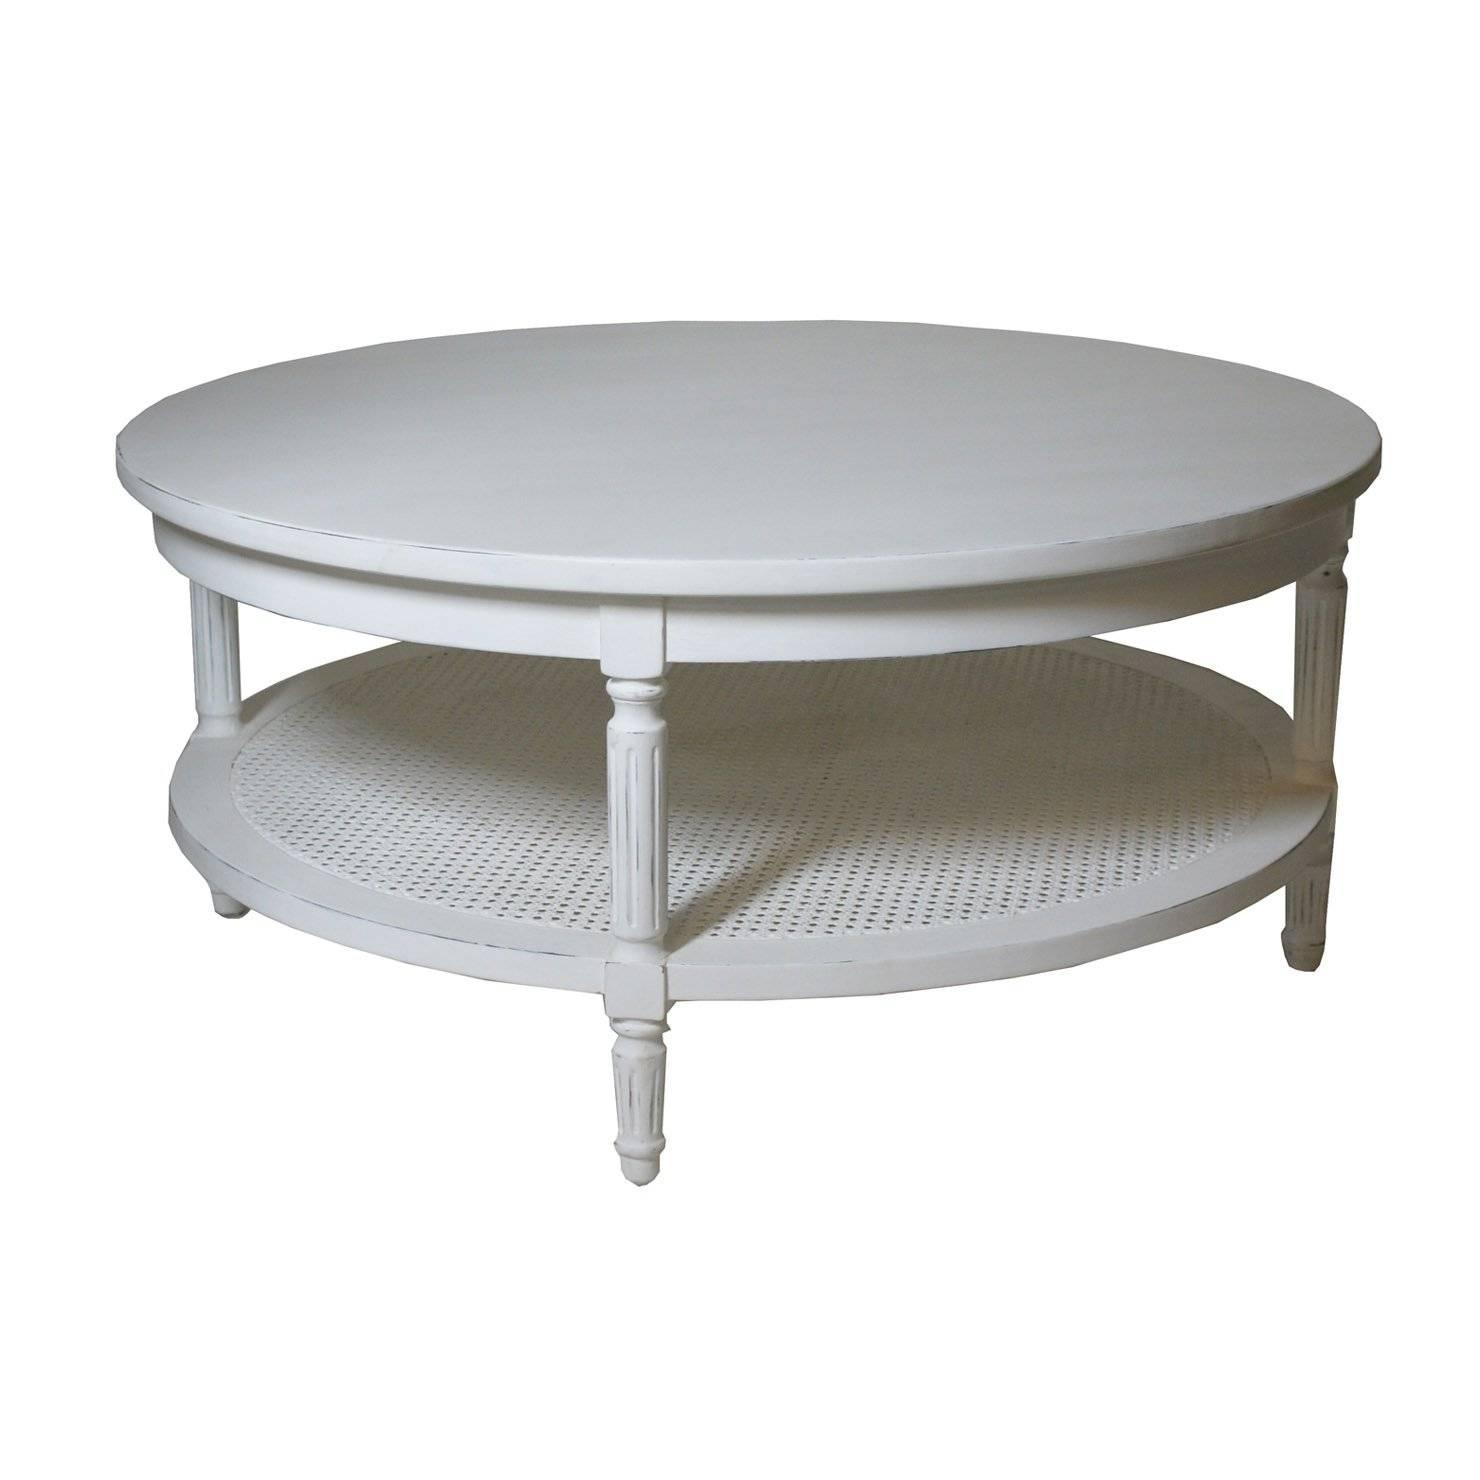 Circle Coffee Table Wood Circle Coffee Table Good Wood Coffee throughout Circle Coffee Tables (Image 6 of 30)